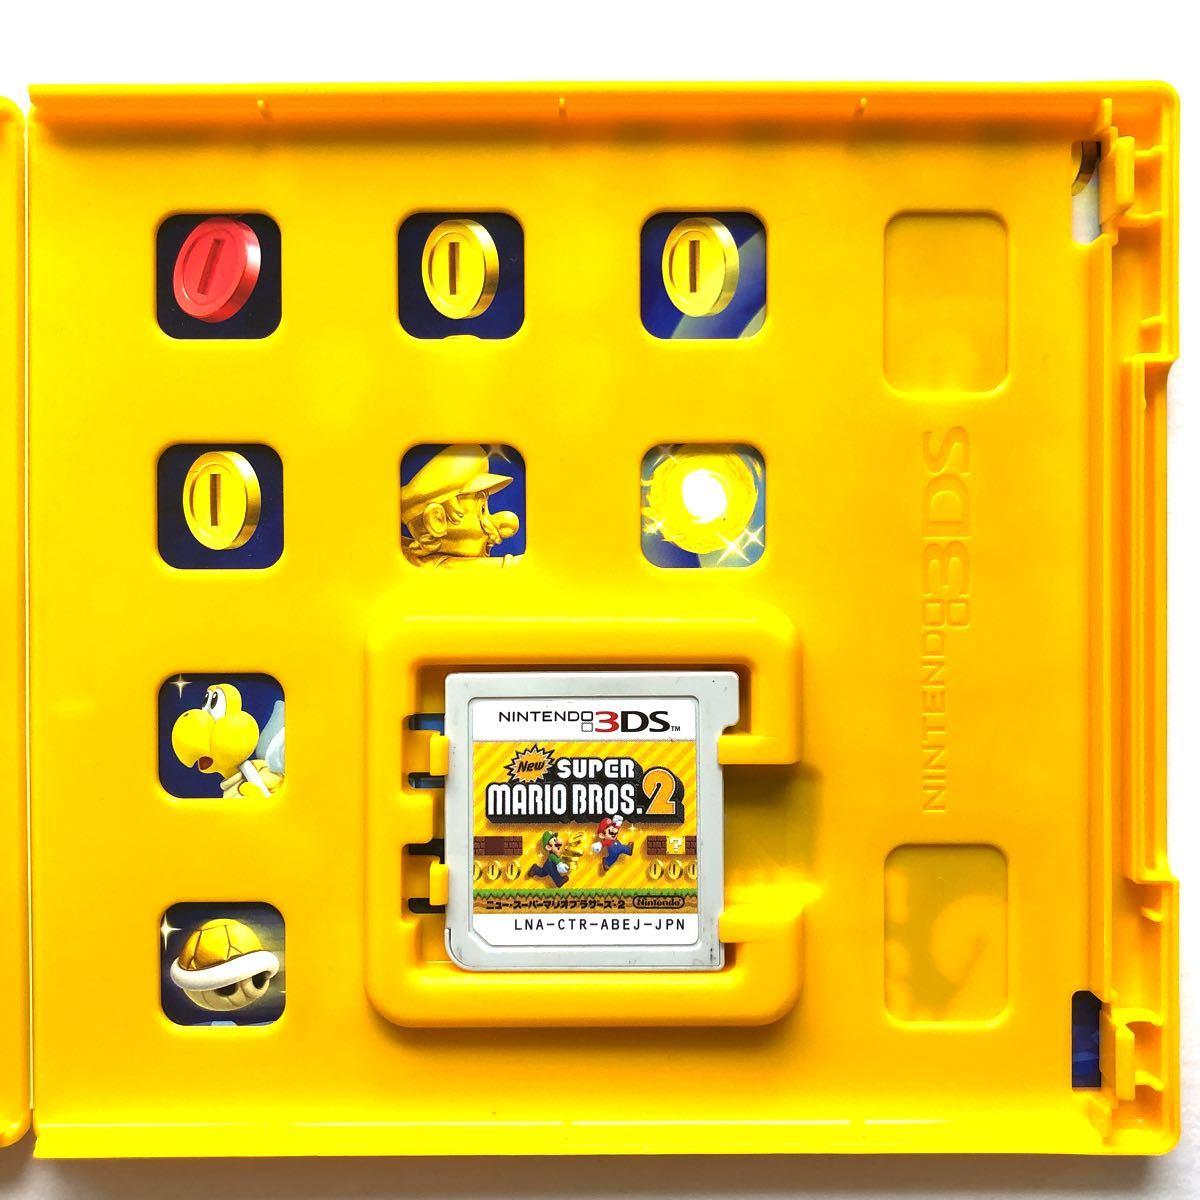 Newスーパーマリオブラザーズ2 3DSソフト